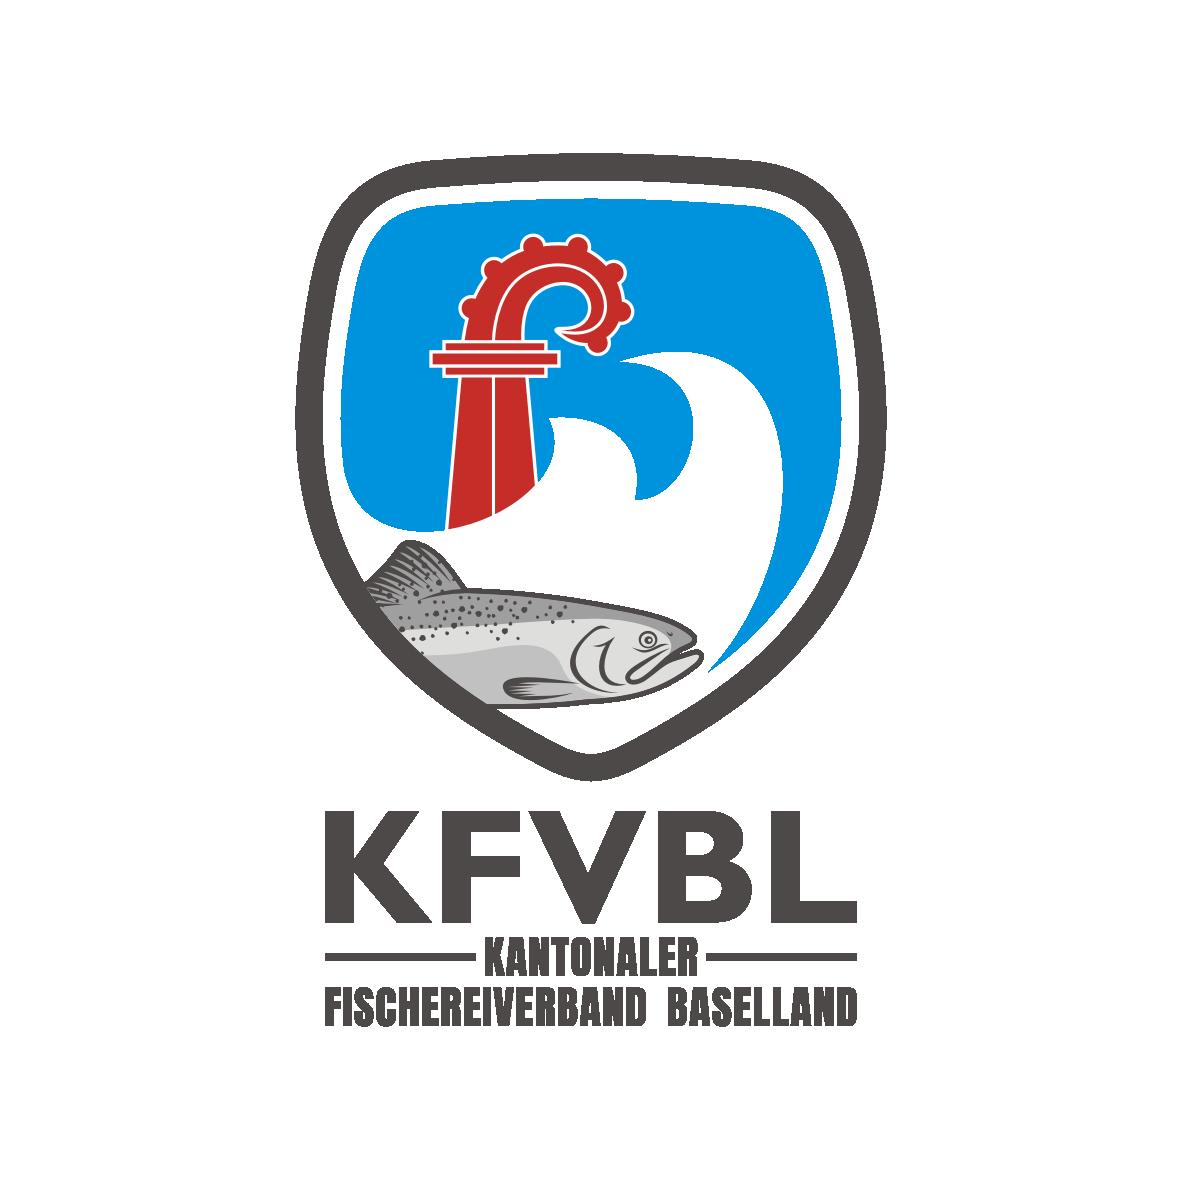 KFVBL